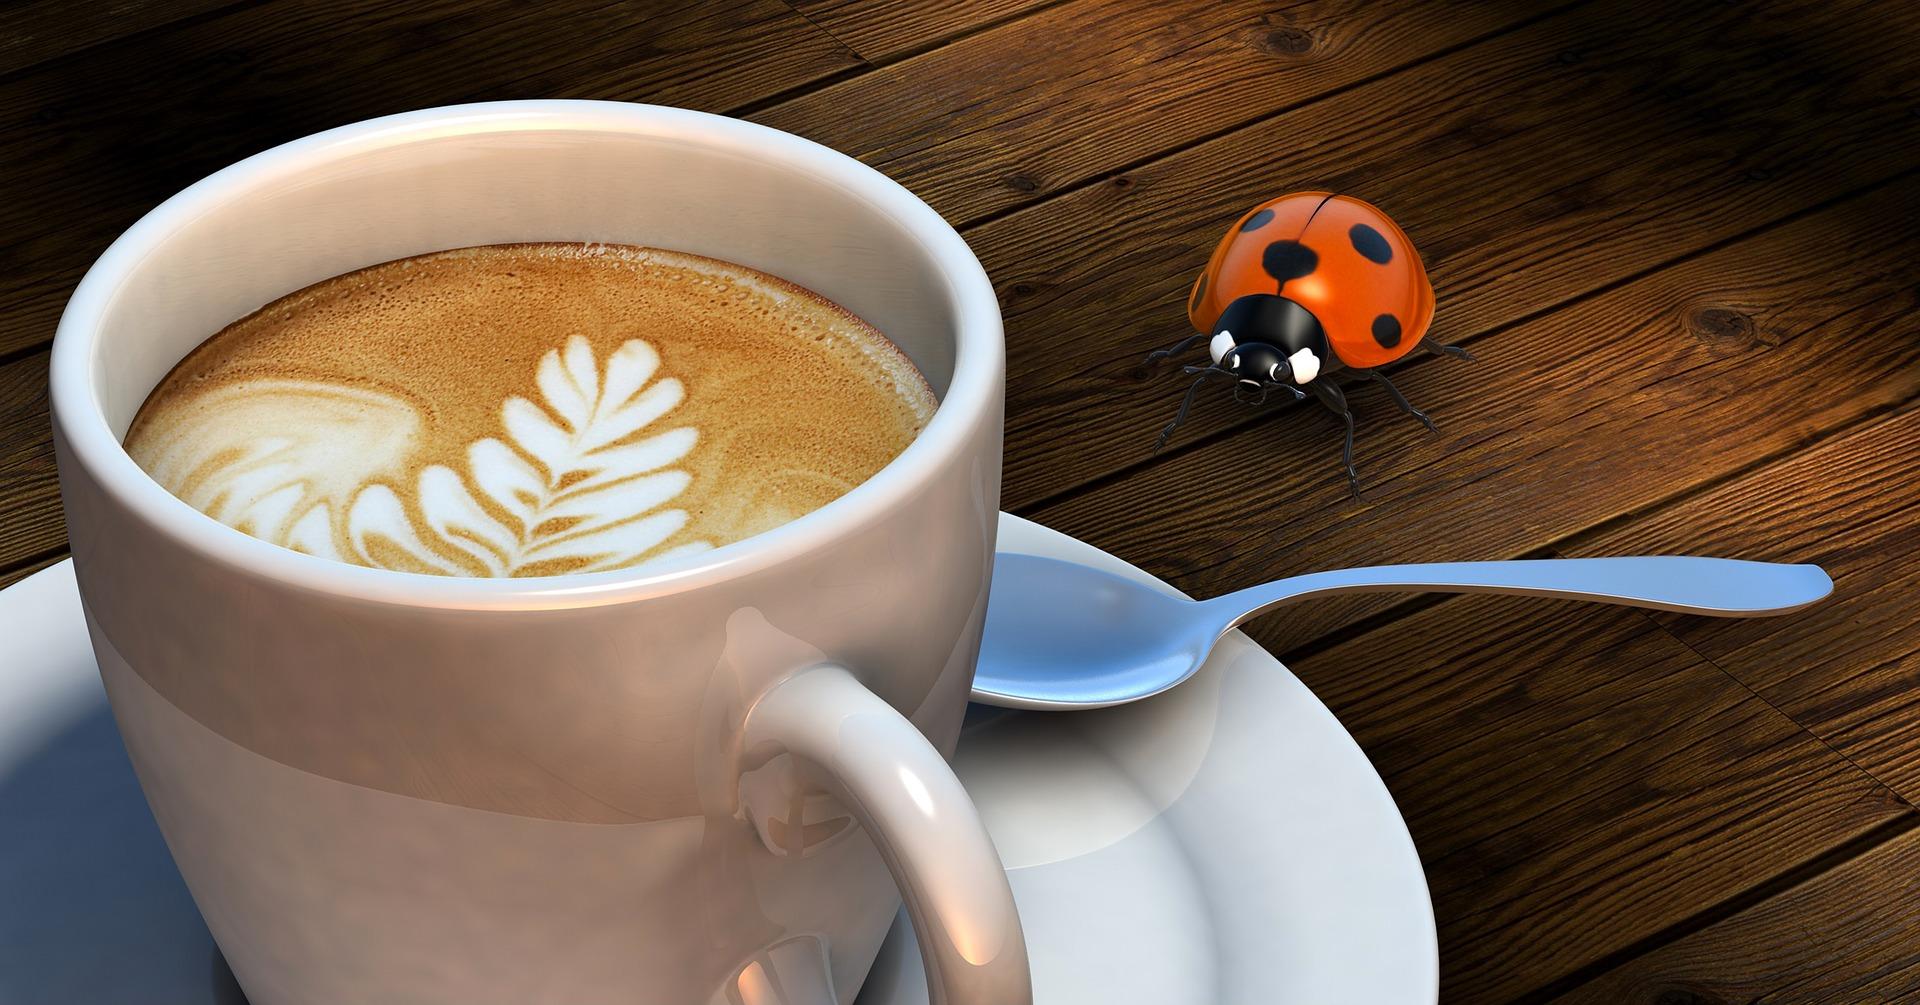 Benutztes Kaffeepulver soll Palmöl ersetzen